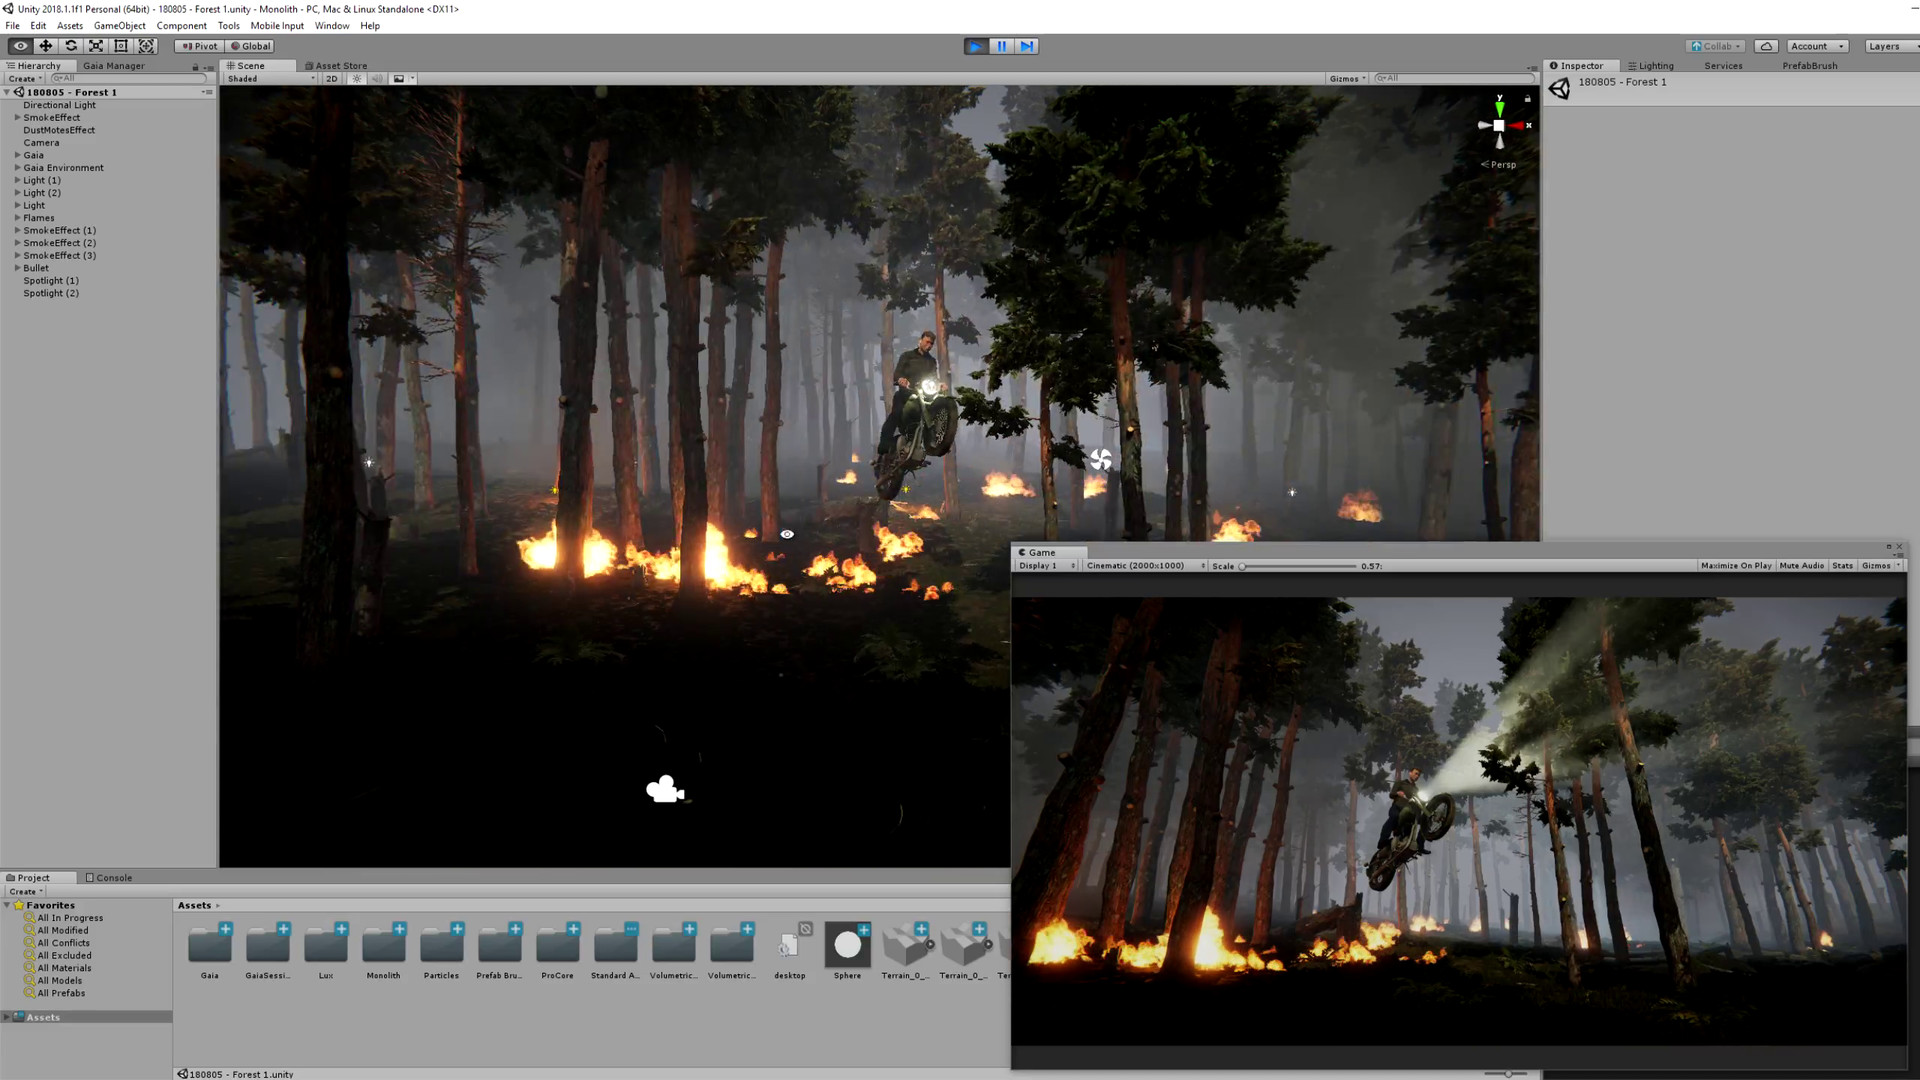 Bram sels jagsters scene burning forest bram sels unity